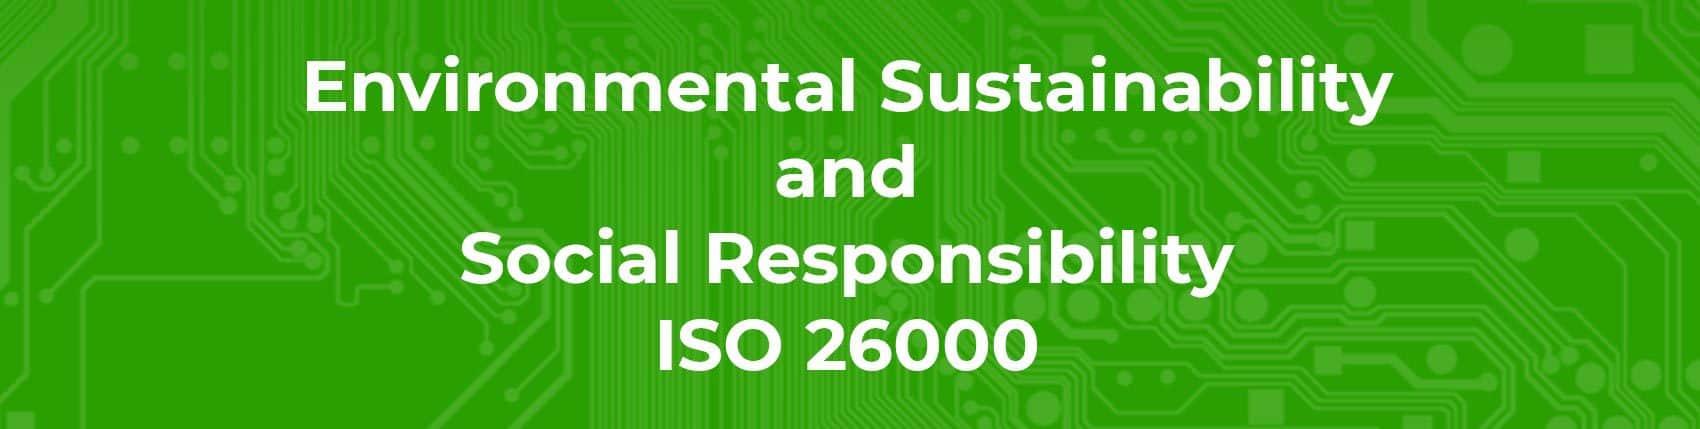 Environmental-Sustainability-Blog-Banner